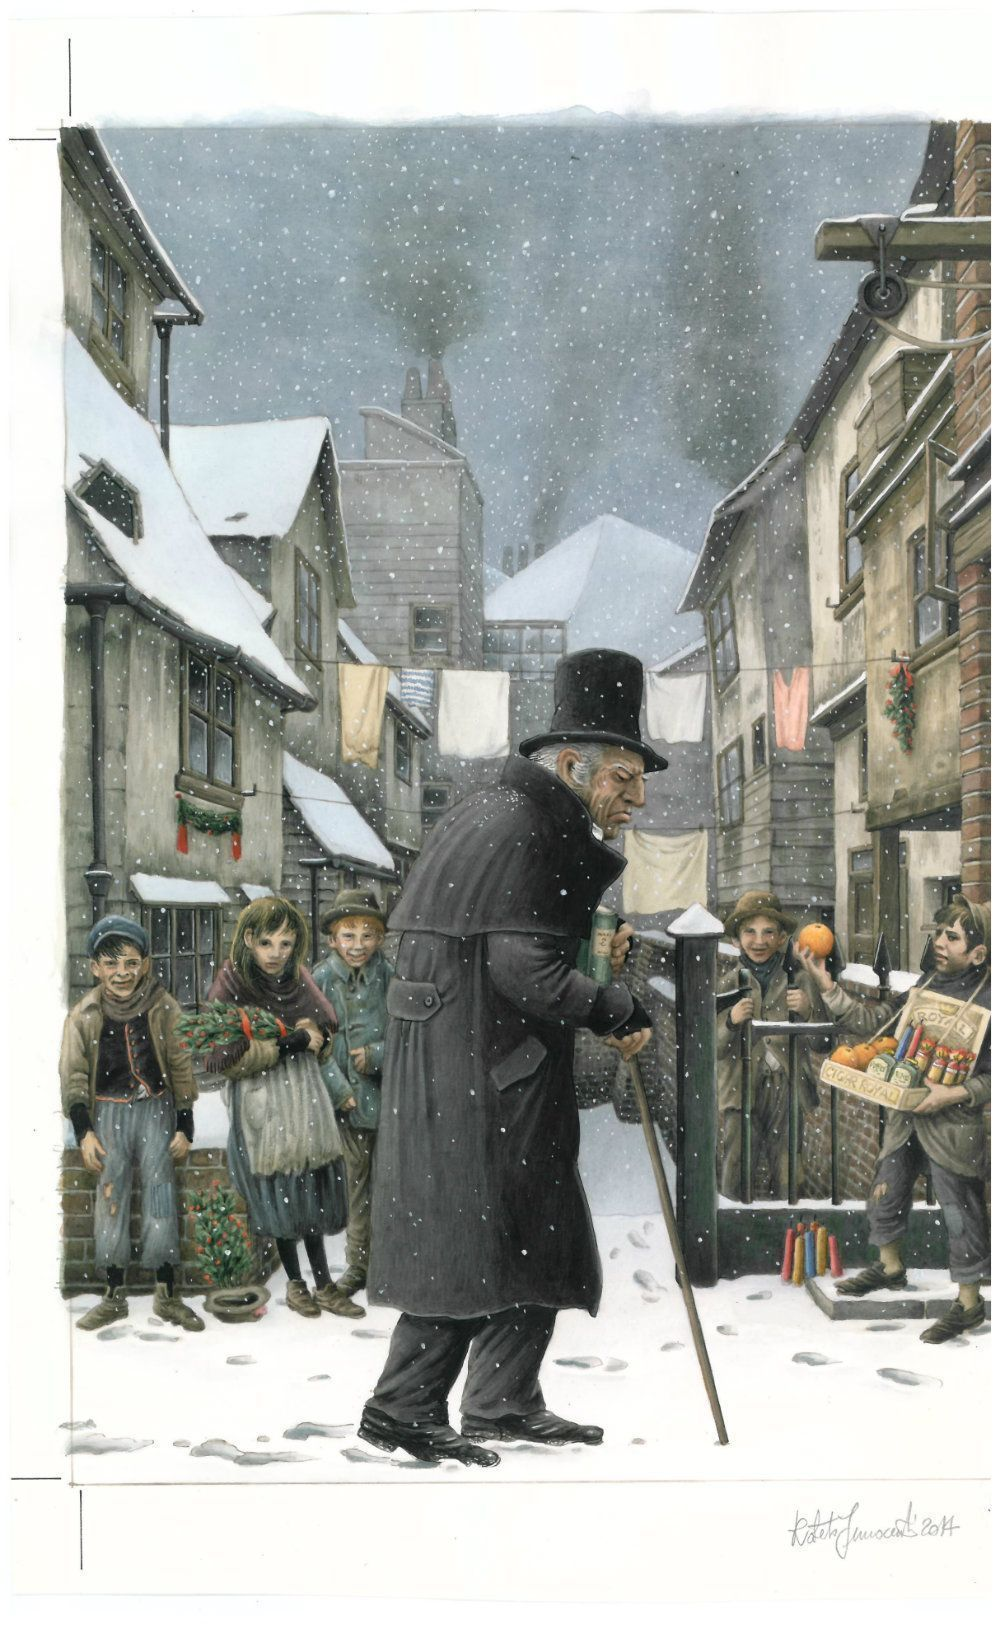 A Christmas Carol : Un conte de Noël toujours d'actualité ! - Studinano, Portfolio de Shou'